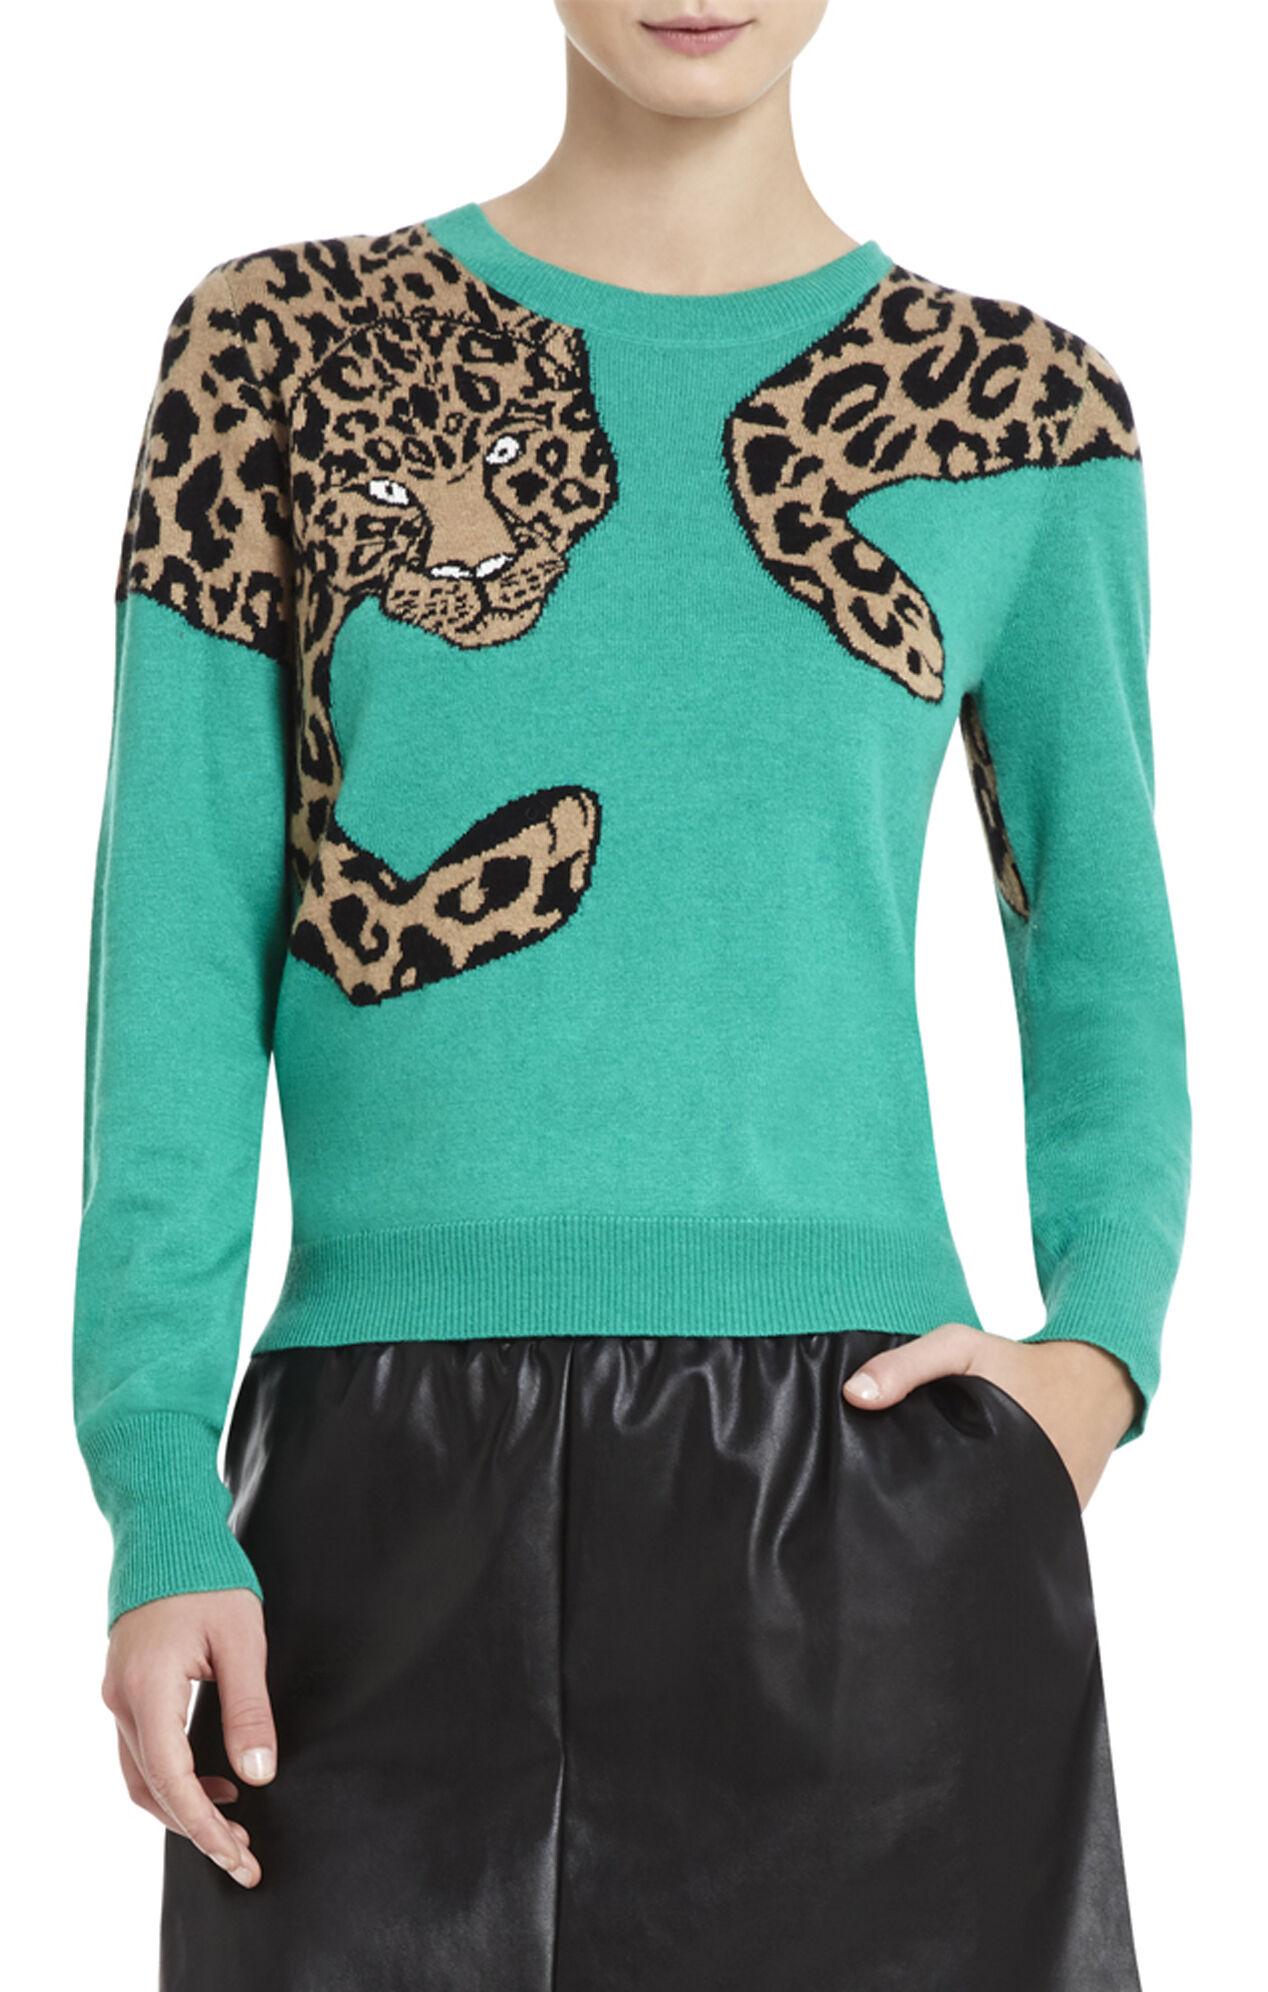 Jaxin Leopard Sweater